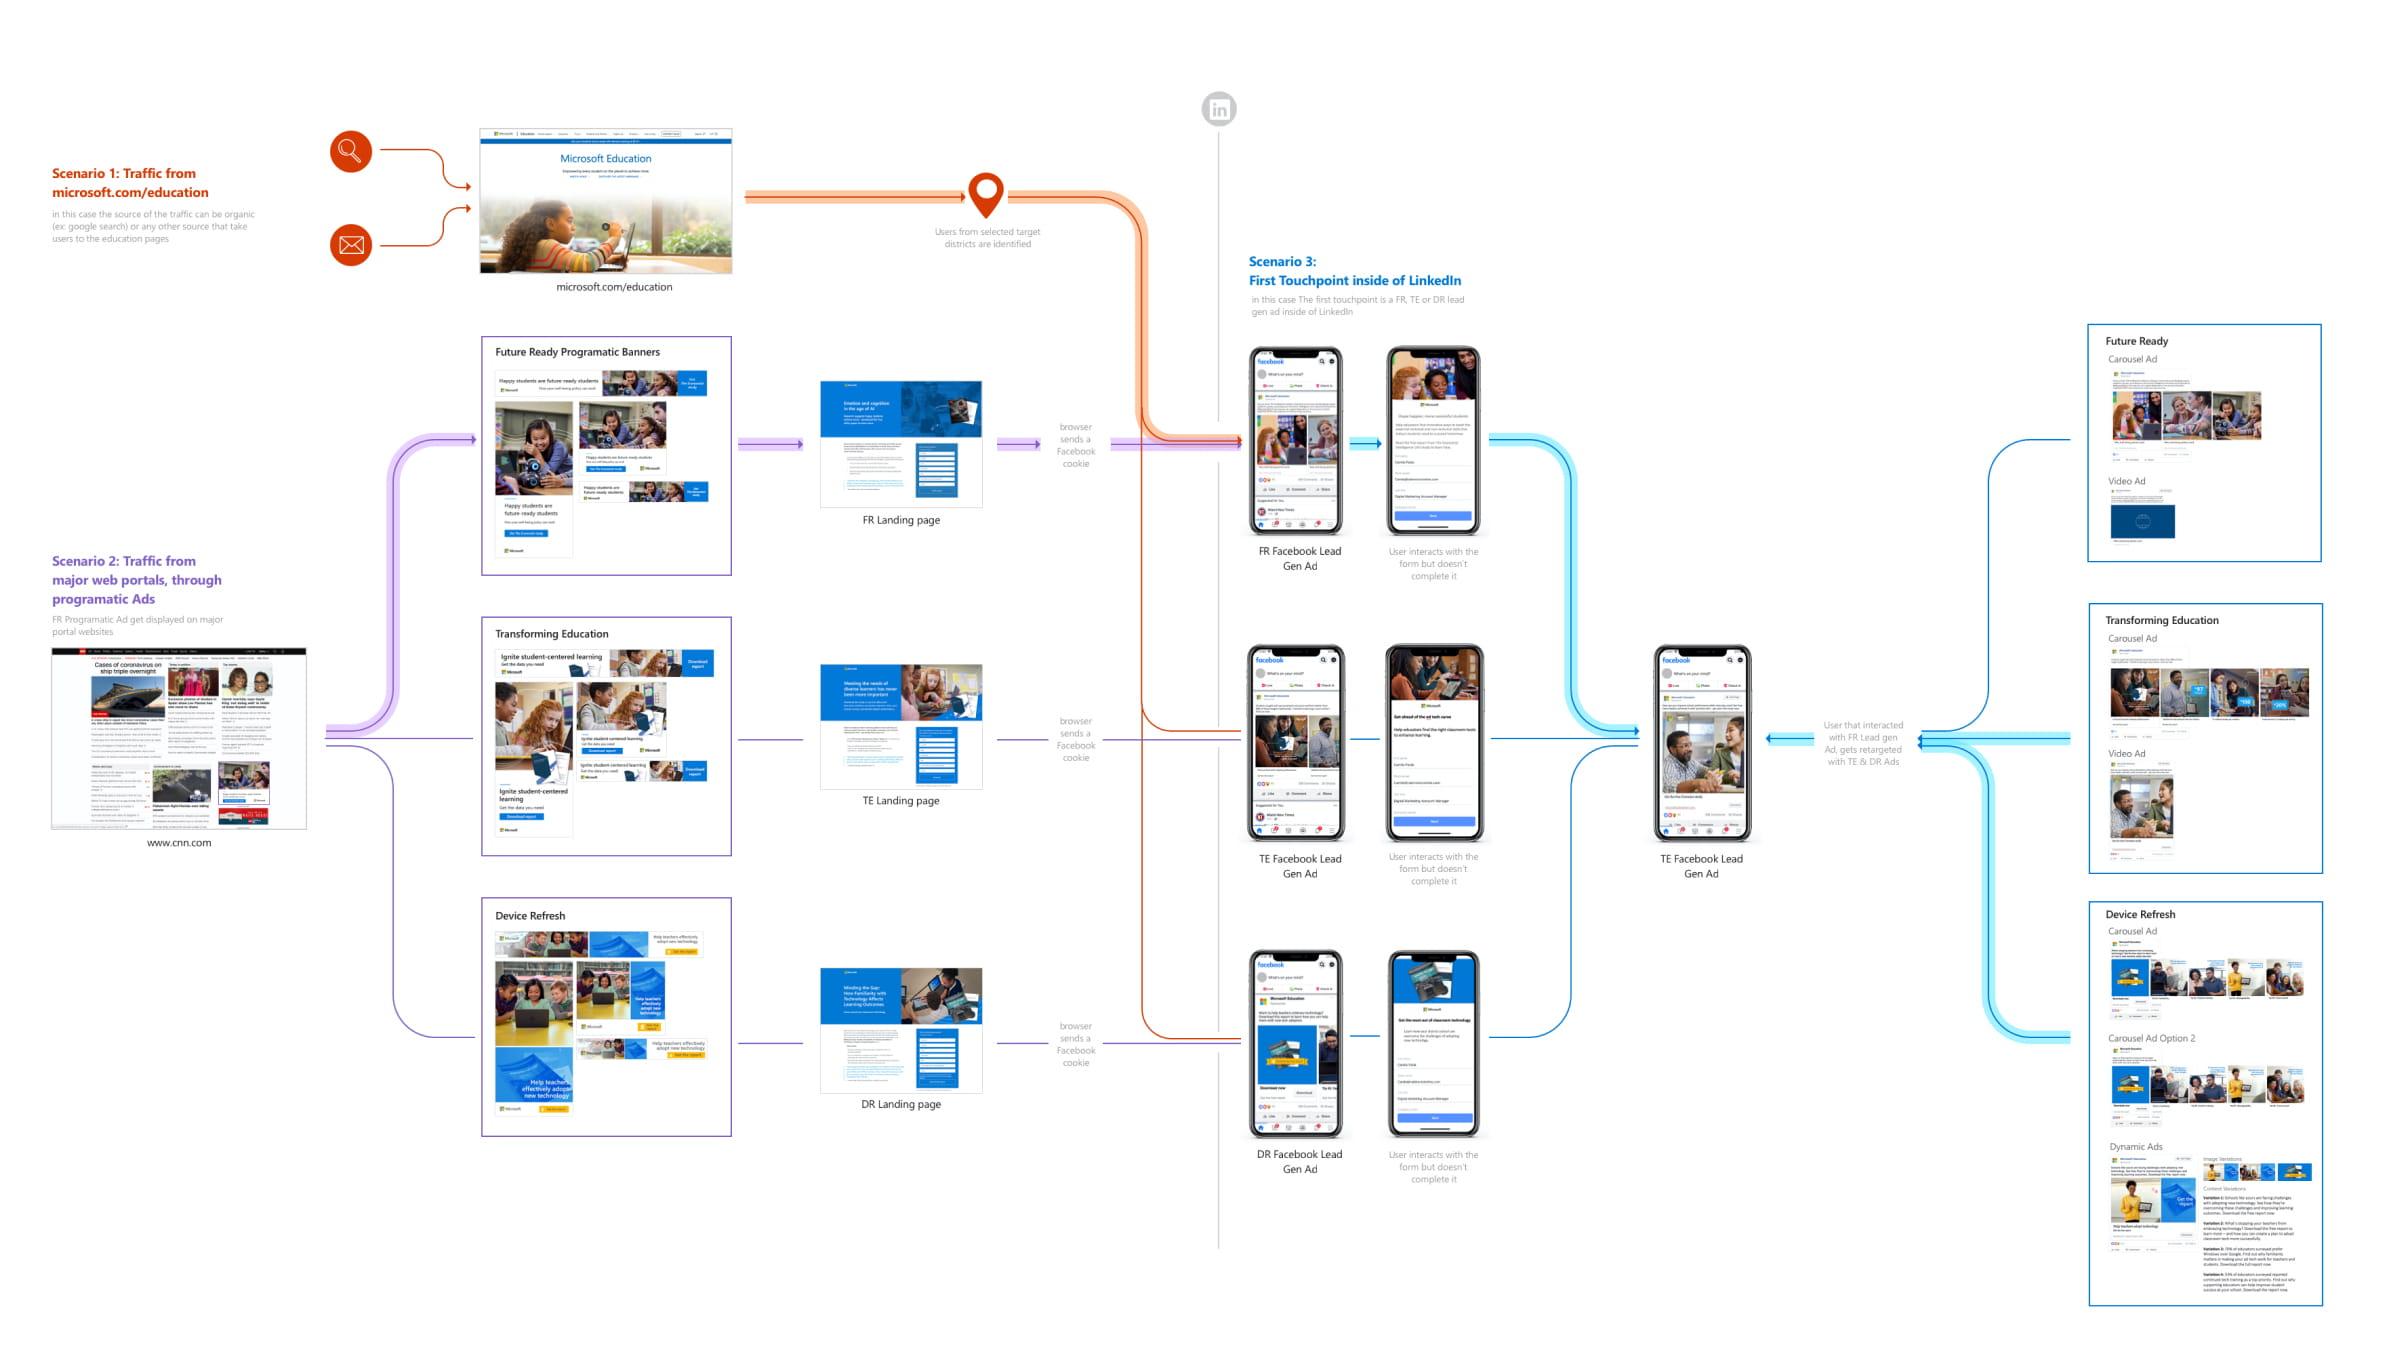 Social Media Retargeting Campaign Architecture